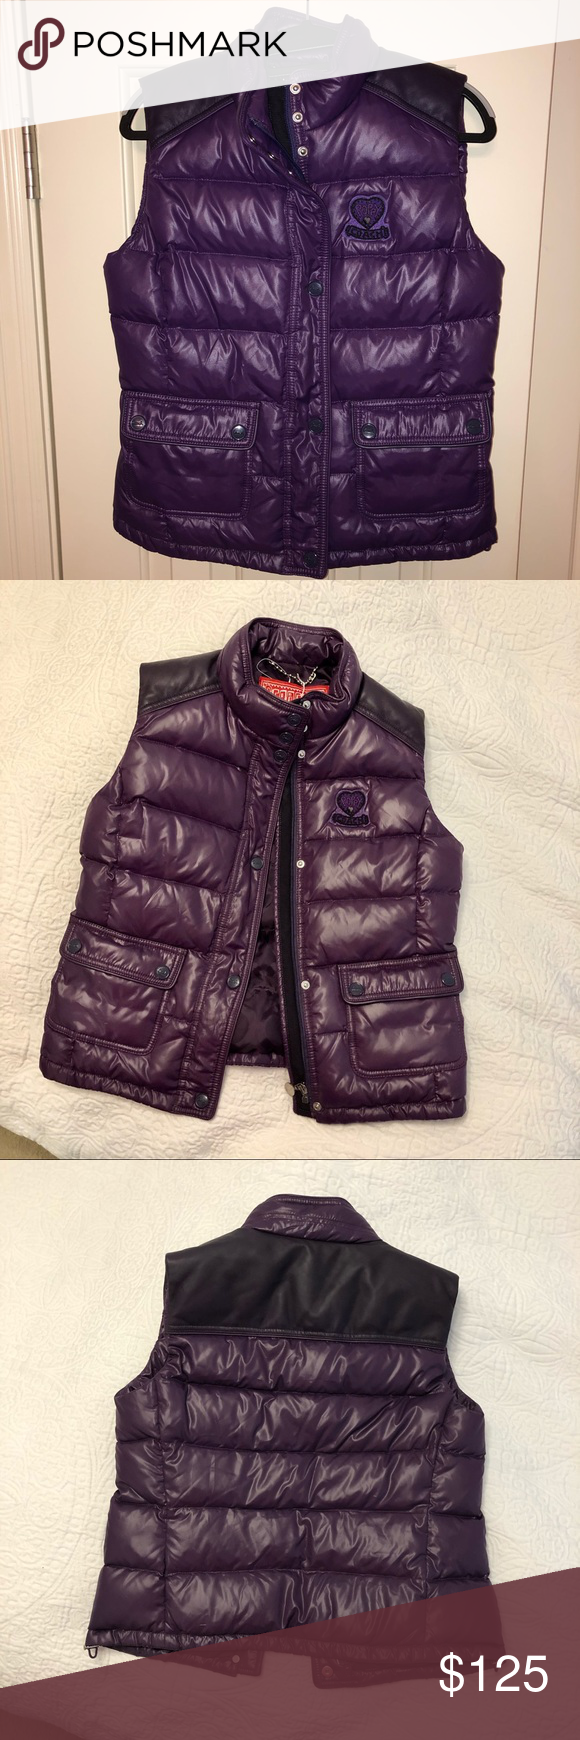 Coach Short Shearling Jacket Shearling jacket, Outerwear